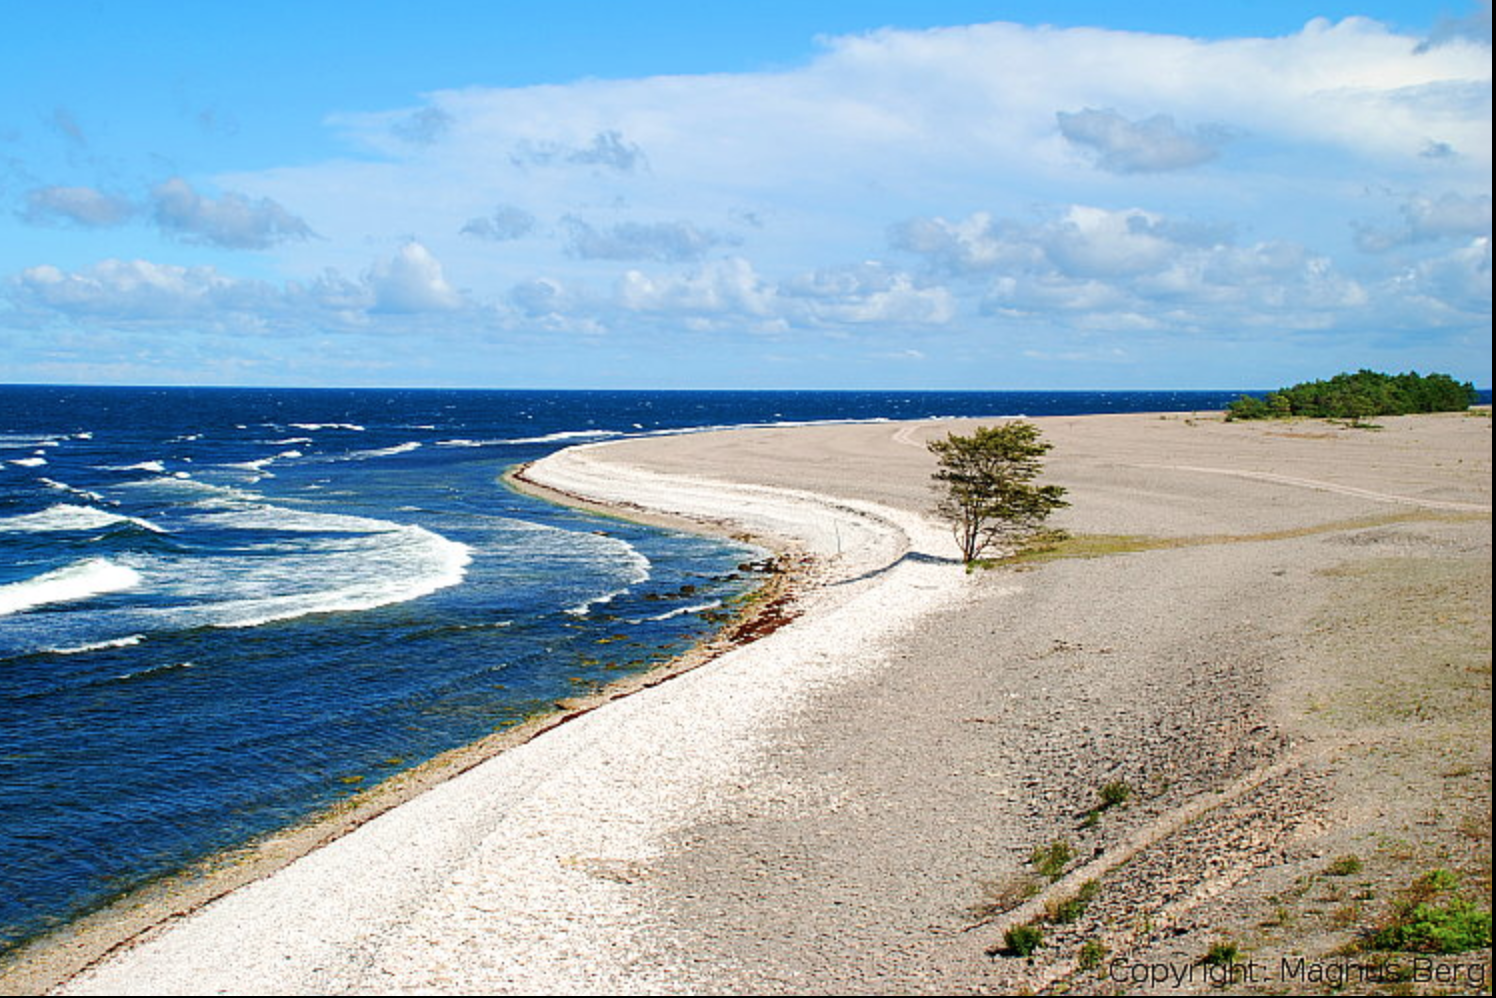 Gotland.png